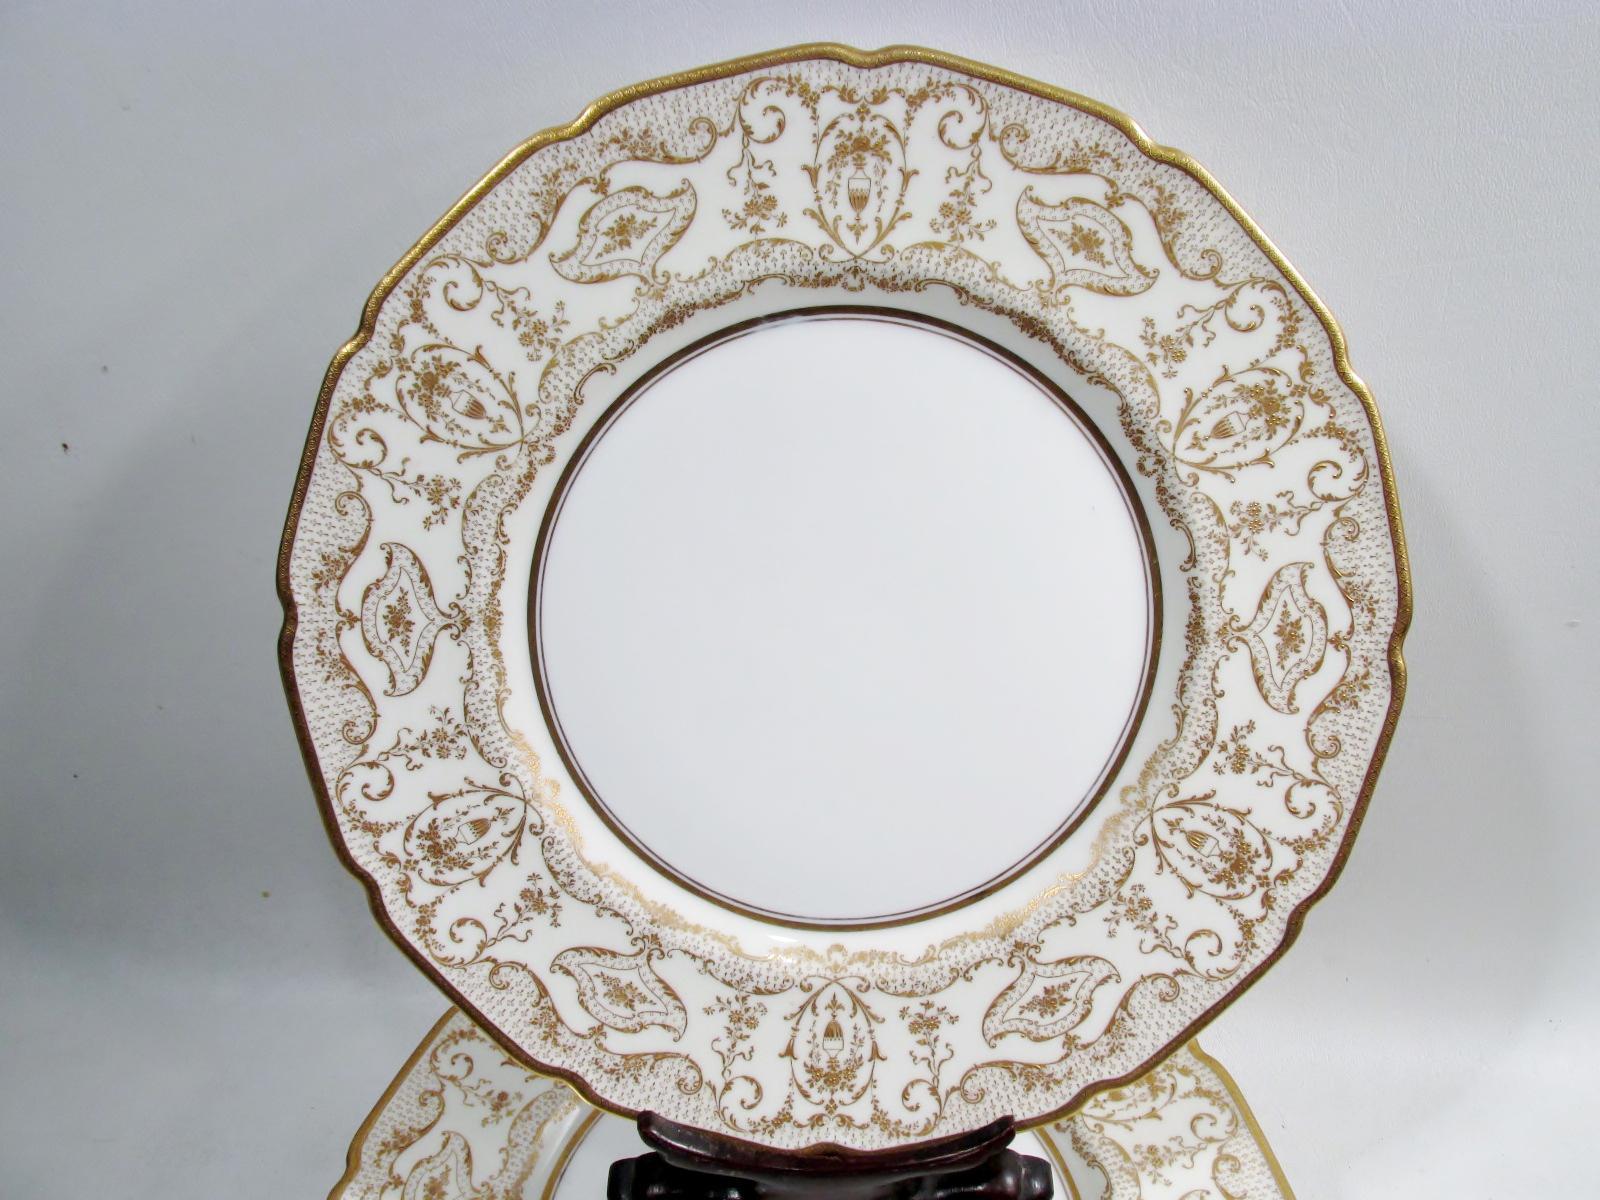 Antique Spaulding u0026 Co Royal Doulton Dinner Plates - Set of 10 - Image 6 of  sc 1 st  Chairish & Antique Spaulding u0026 Co Royal Doulton Dinner Plates - Set of 10 ...